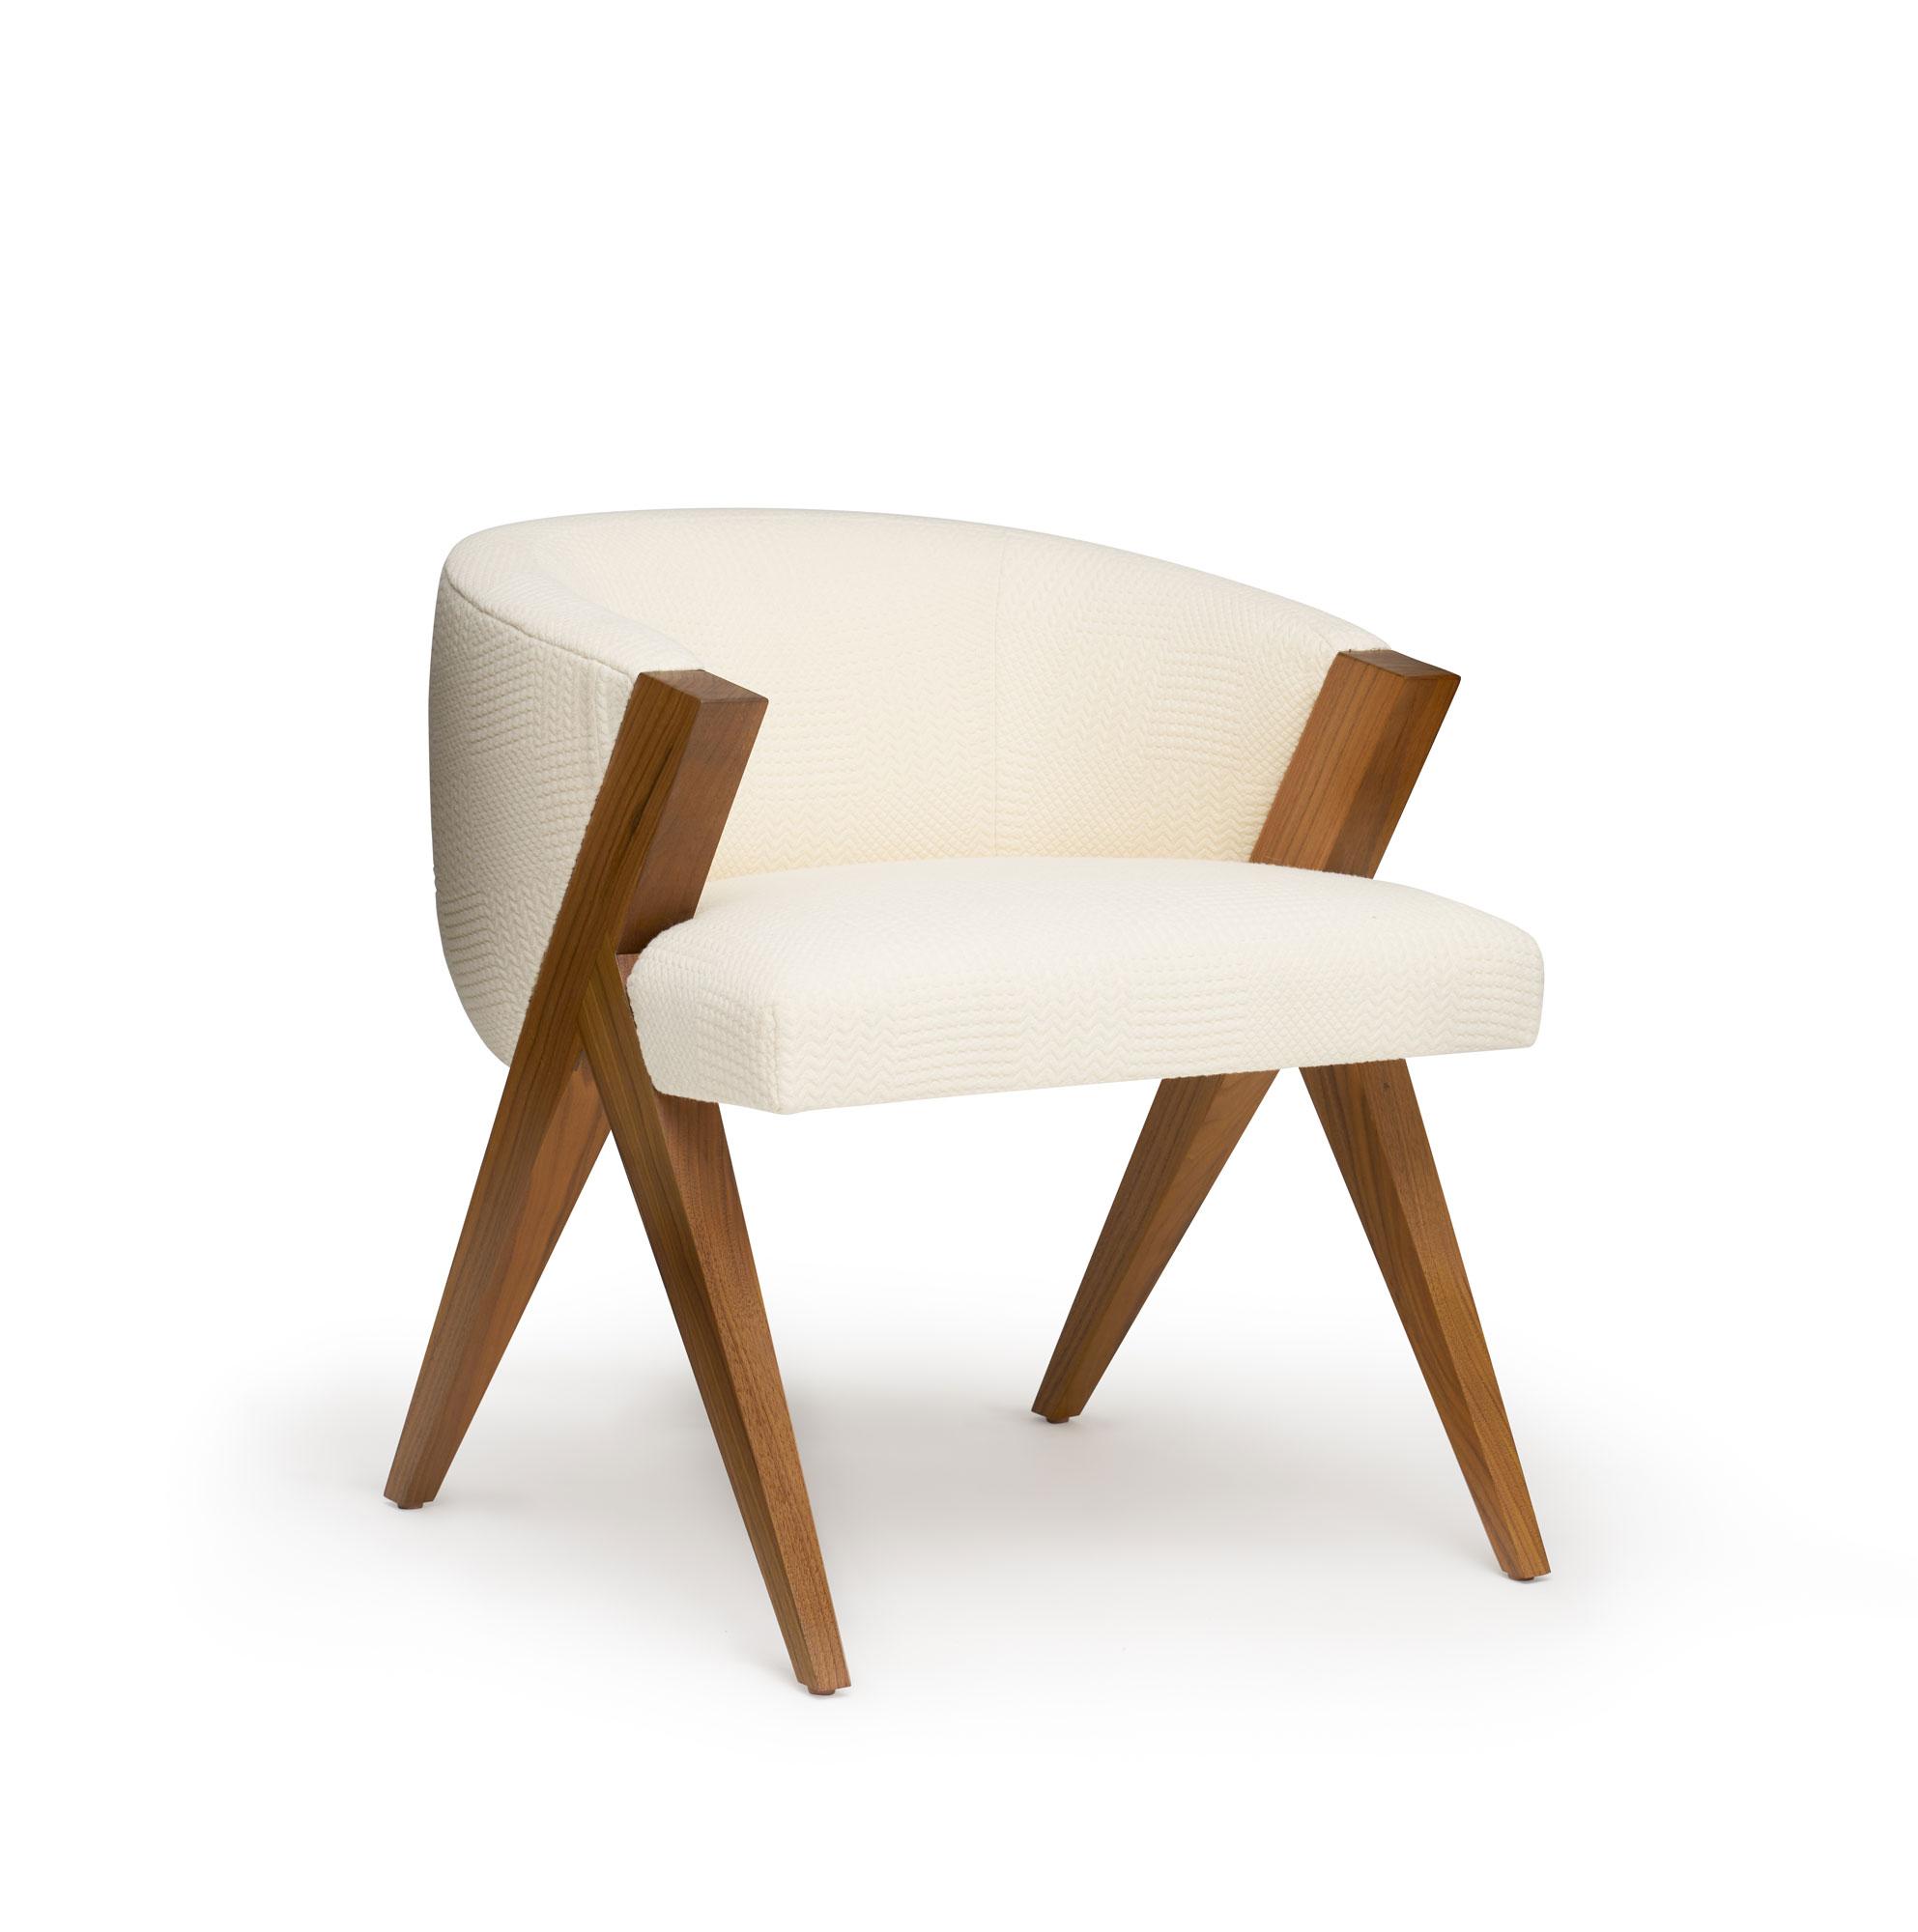 Ellan Dining Arm Chair by Jean De Merry